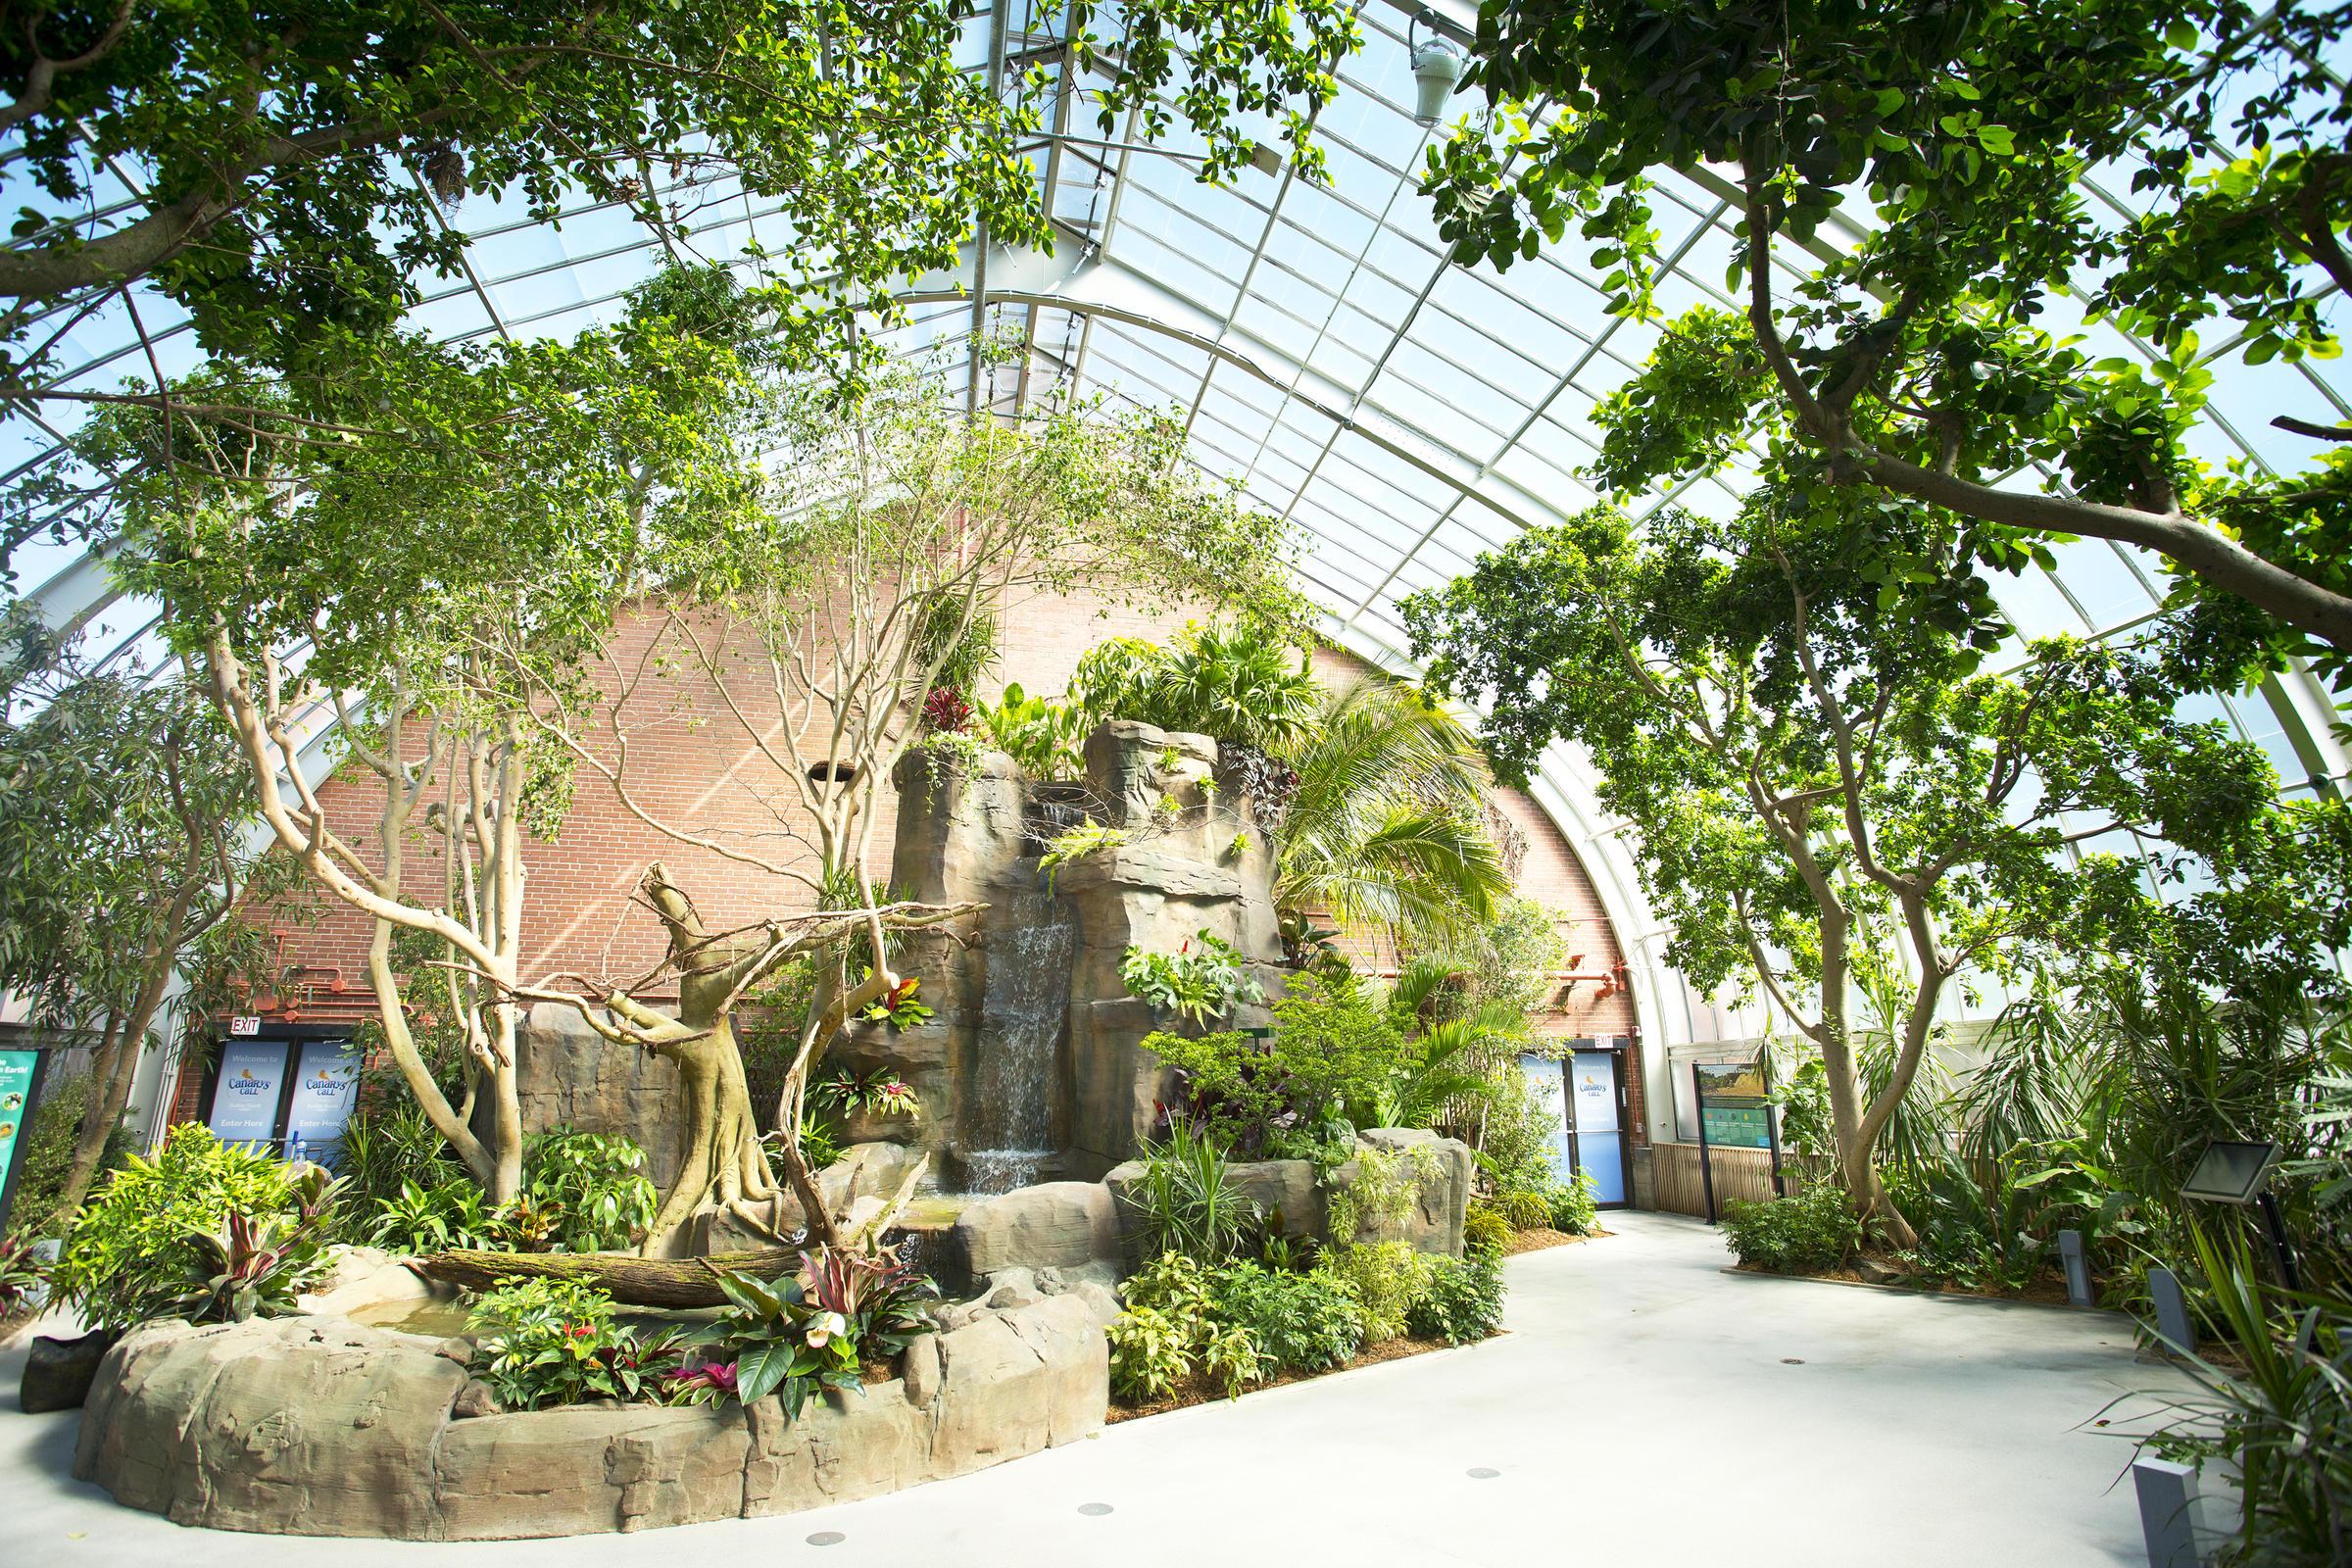 The Aviarys New Waterfall Is 15 Feet Tall